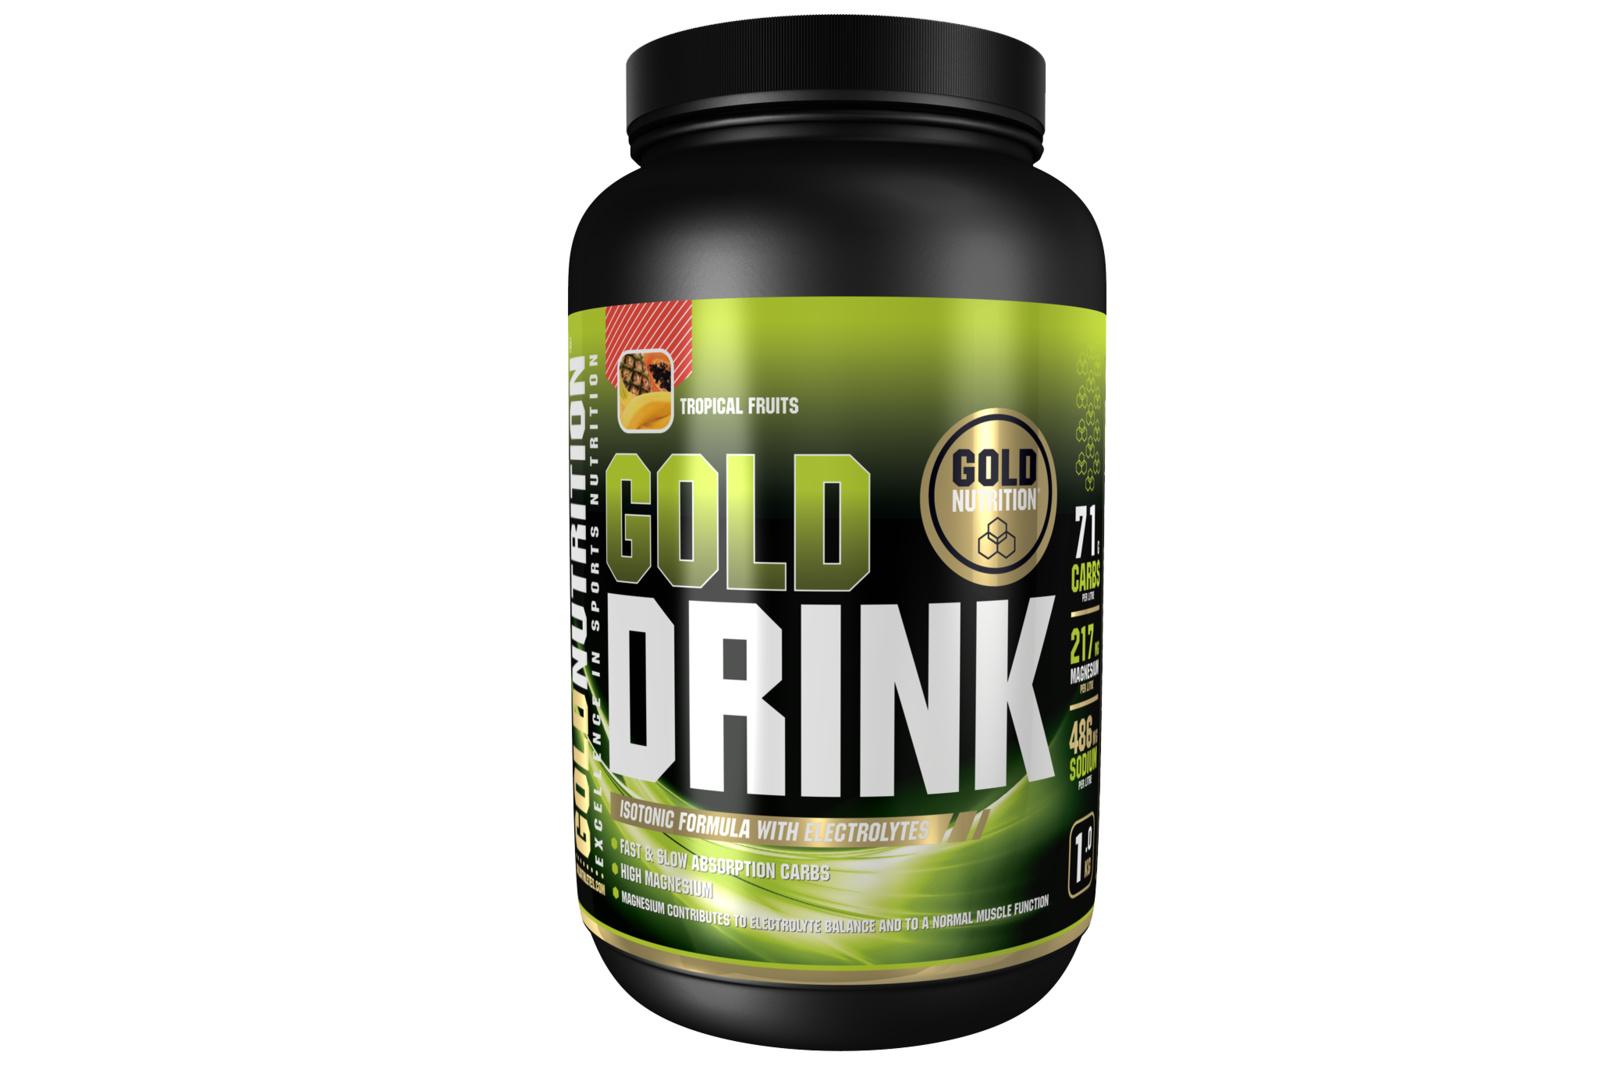 GOLDNUTRITION GOLD DRINK TROPICAL 1 KG